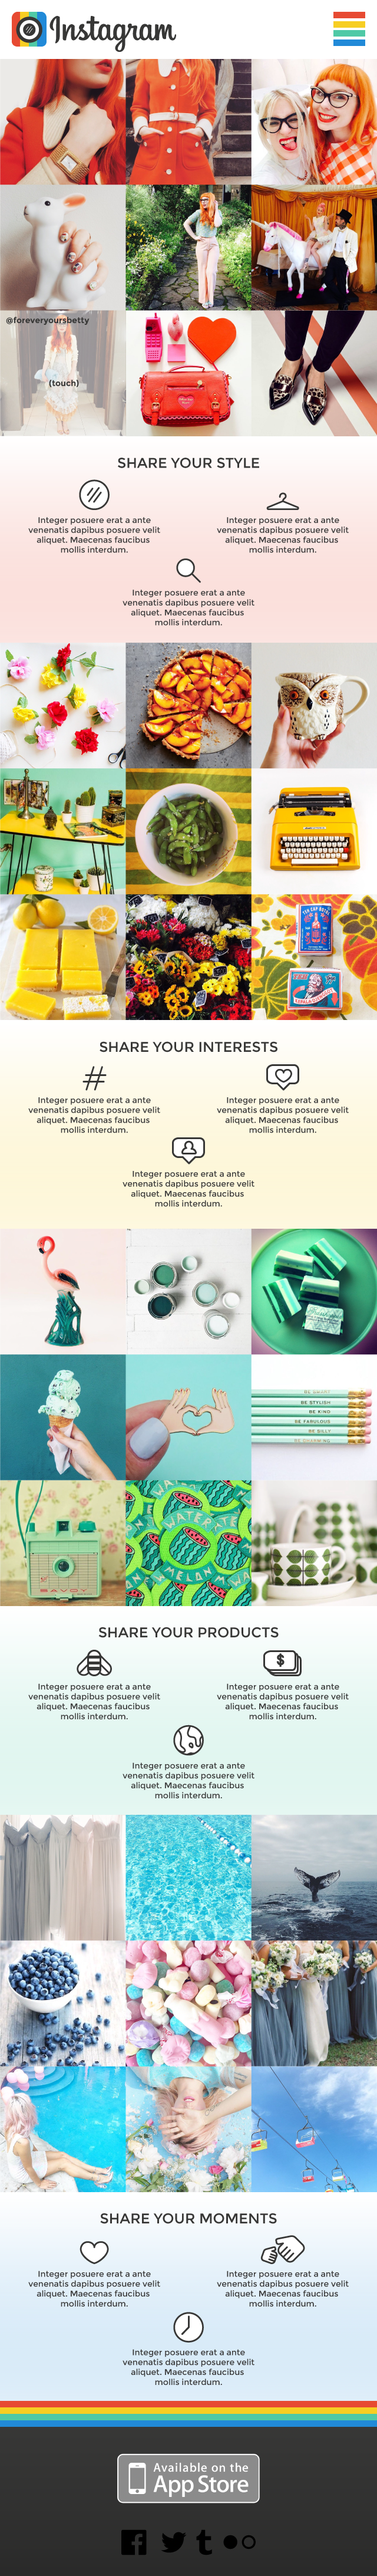 Jenni's Prints - Instagram - Mobile - Graphic Design